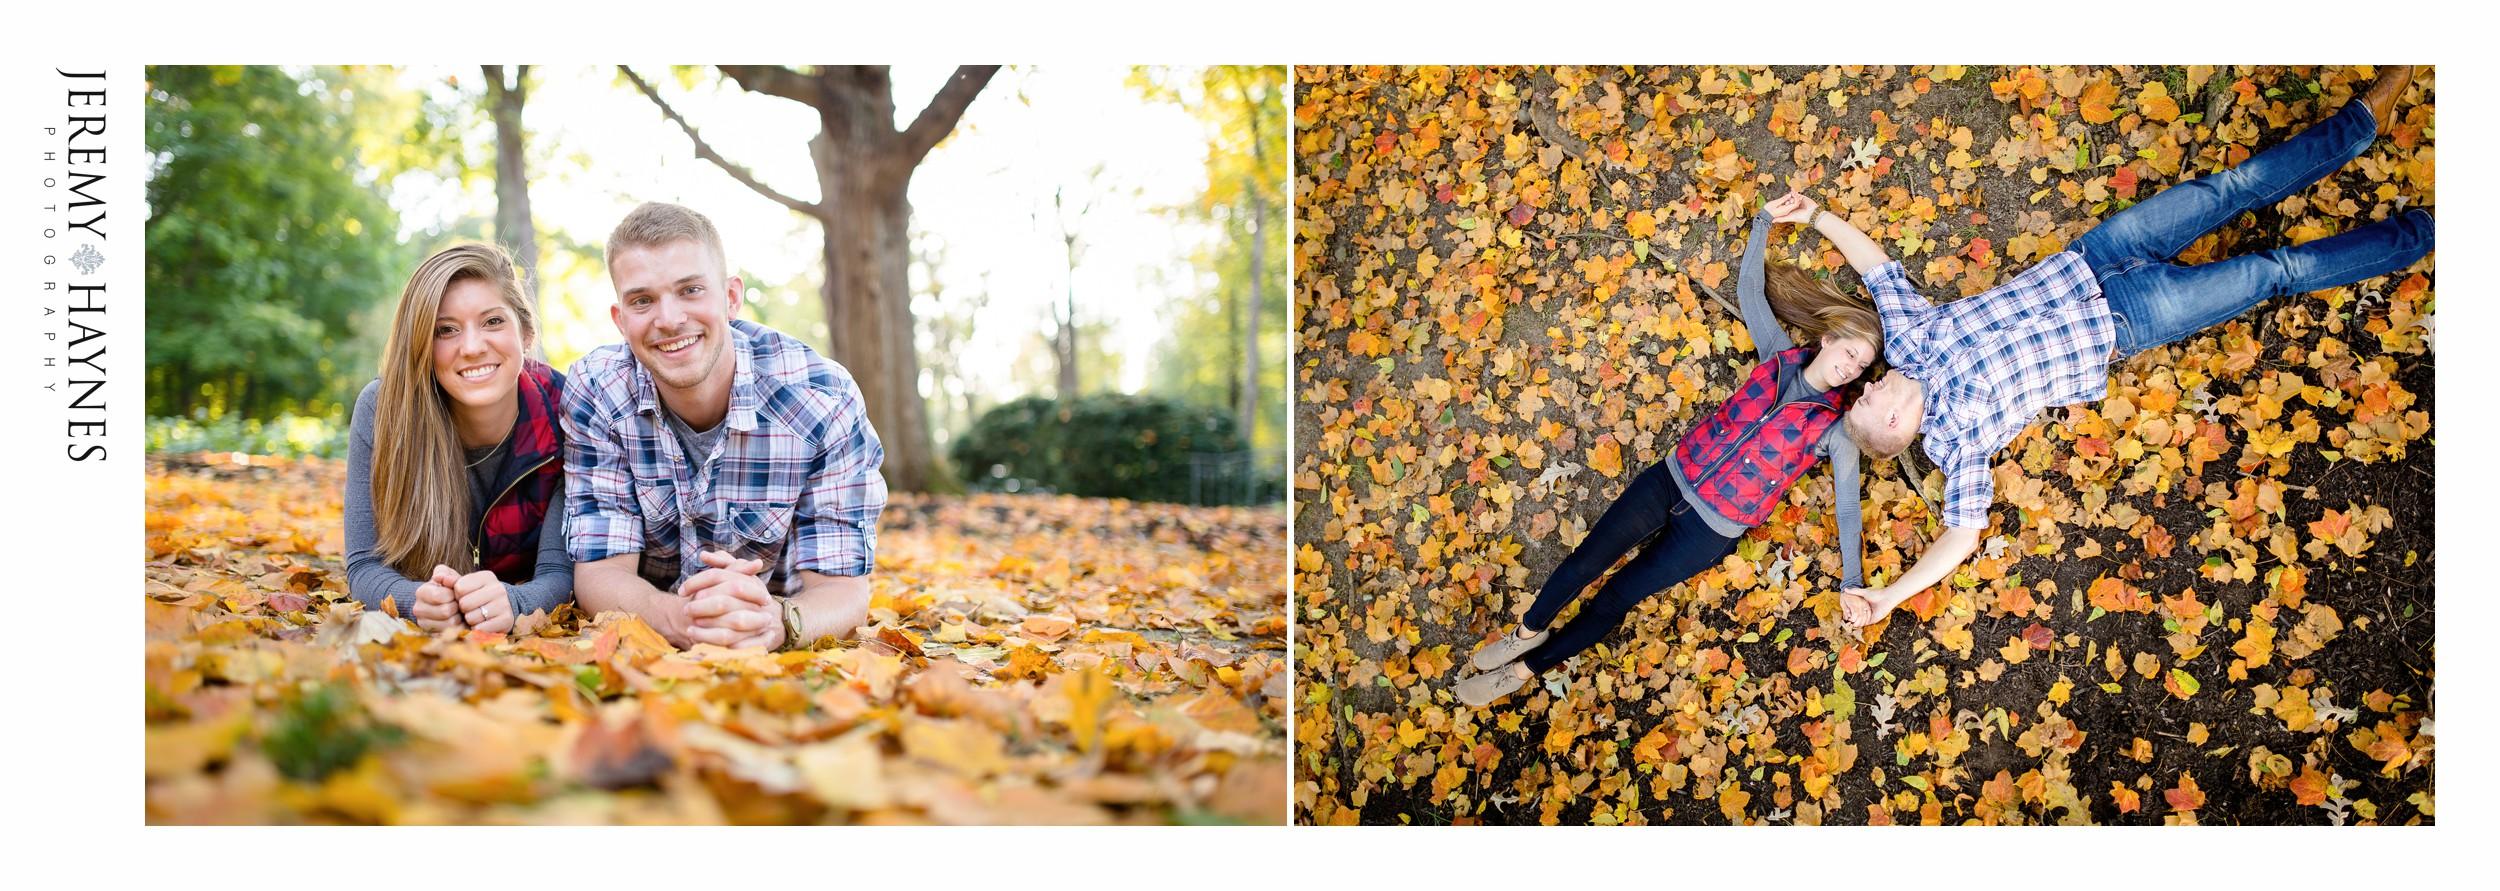 fall-holcomb-gardens-engagement.jpg